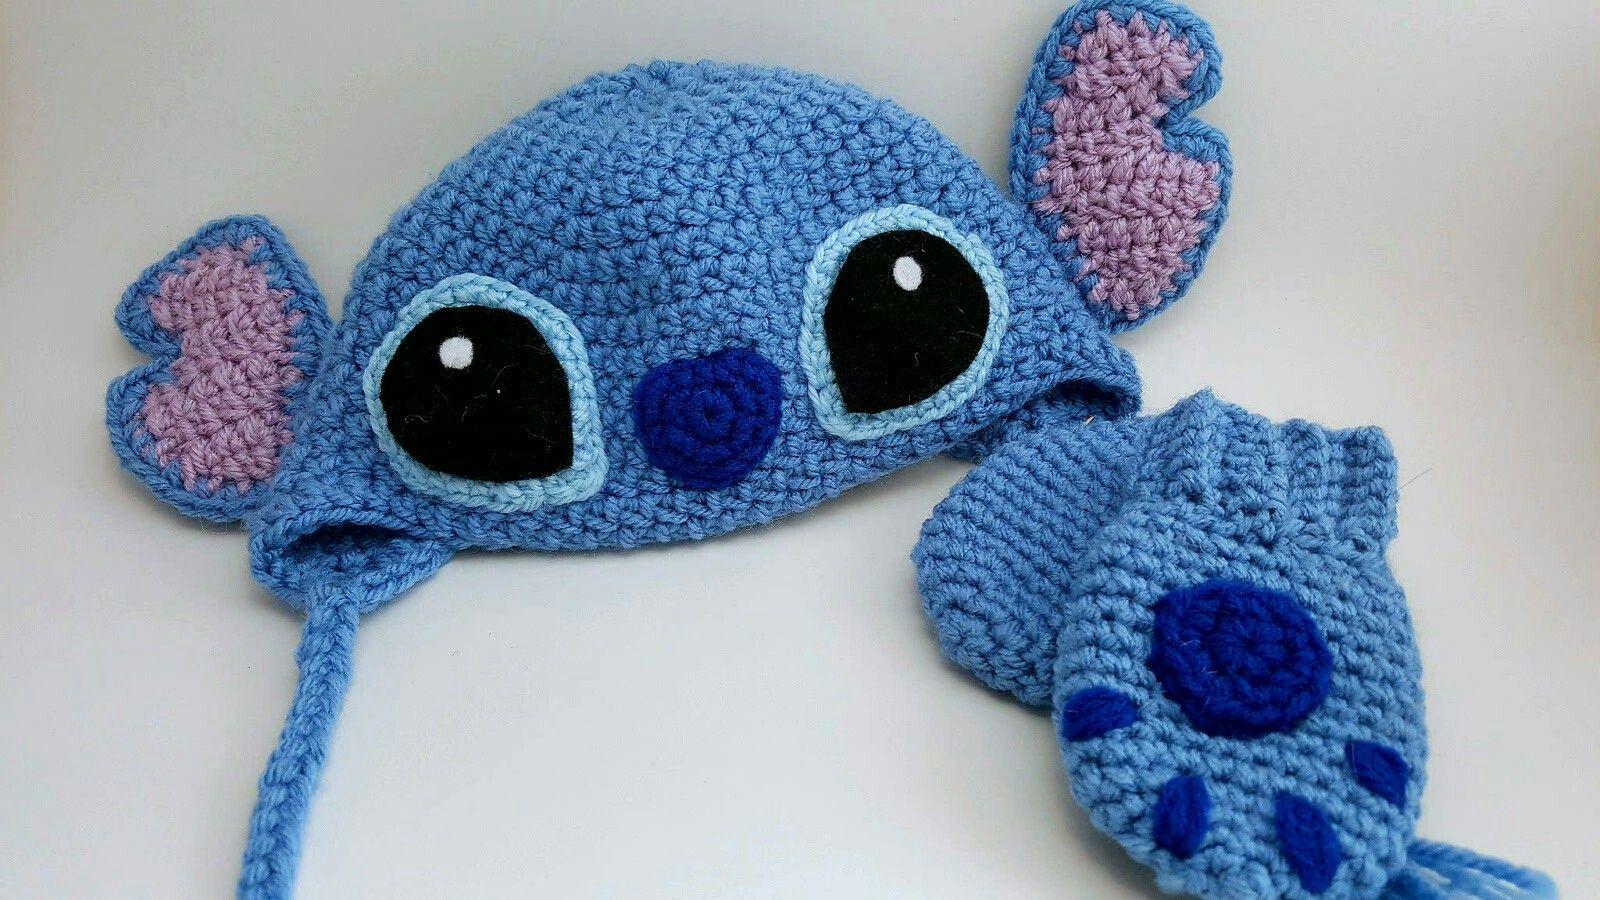 Crochet stitch baby beanie and mittens, disney lilo and stitch ...